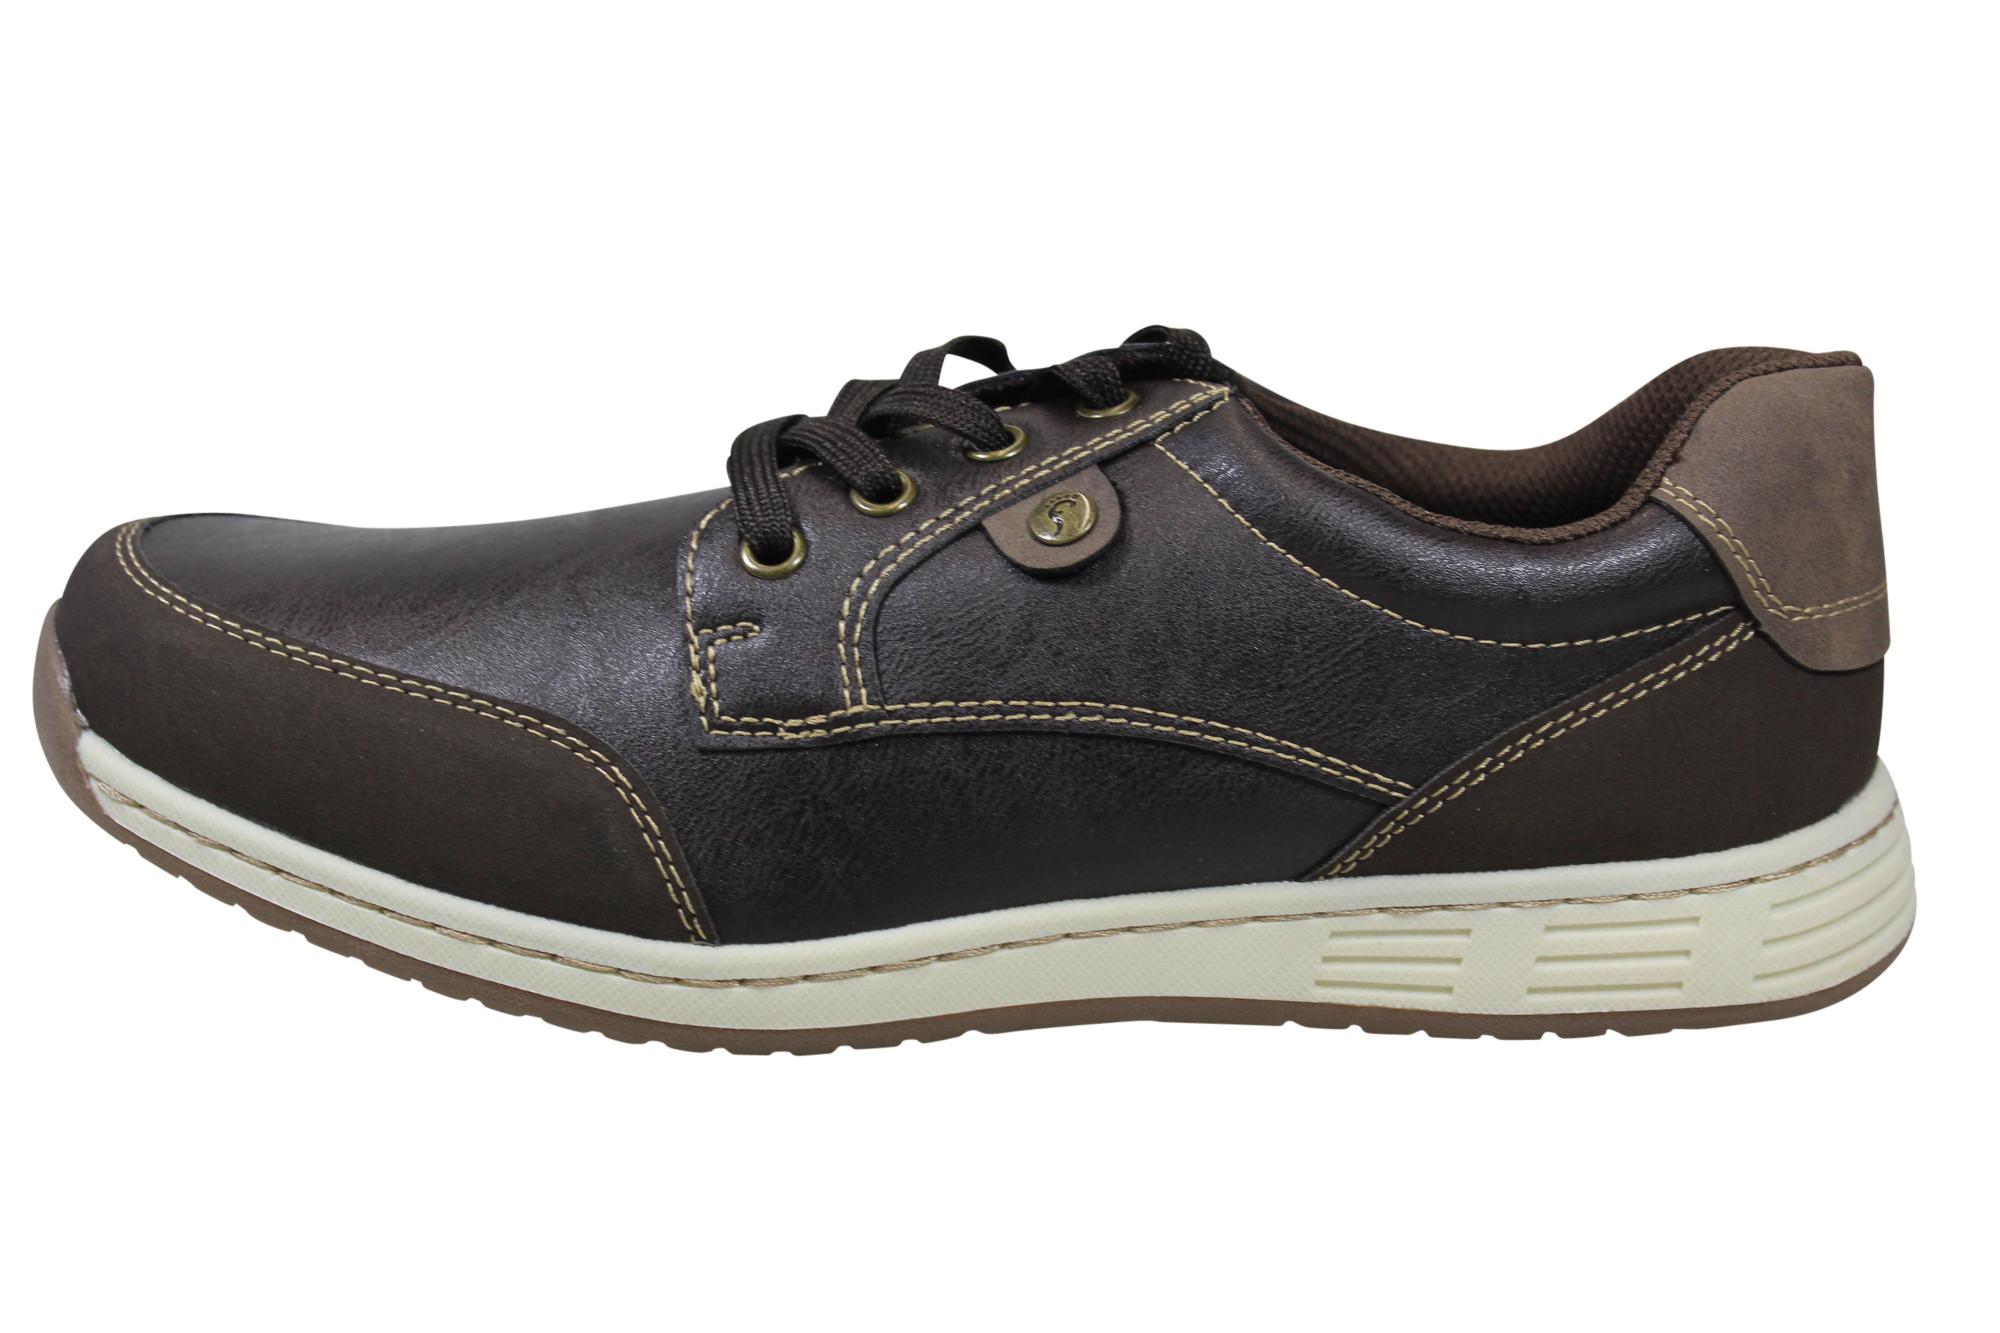 NEU footflexx LIVERGY® Herrenschuhe Sneaker Schnür-Halbschuhe grau Shoes kg21